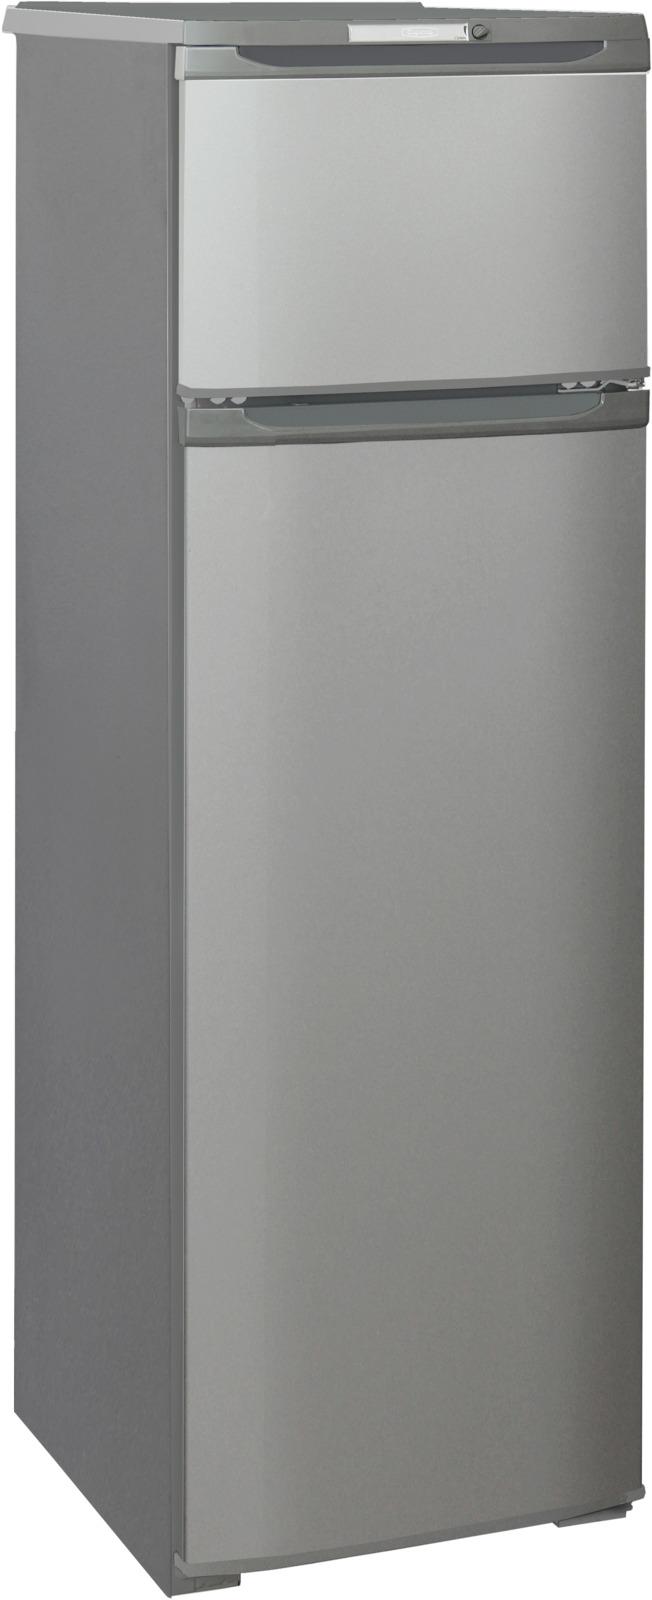 Холодильник Бирюса Б-M124, серый металлик бирюса 133 холодильник б 133